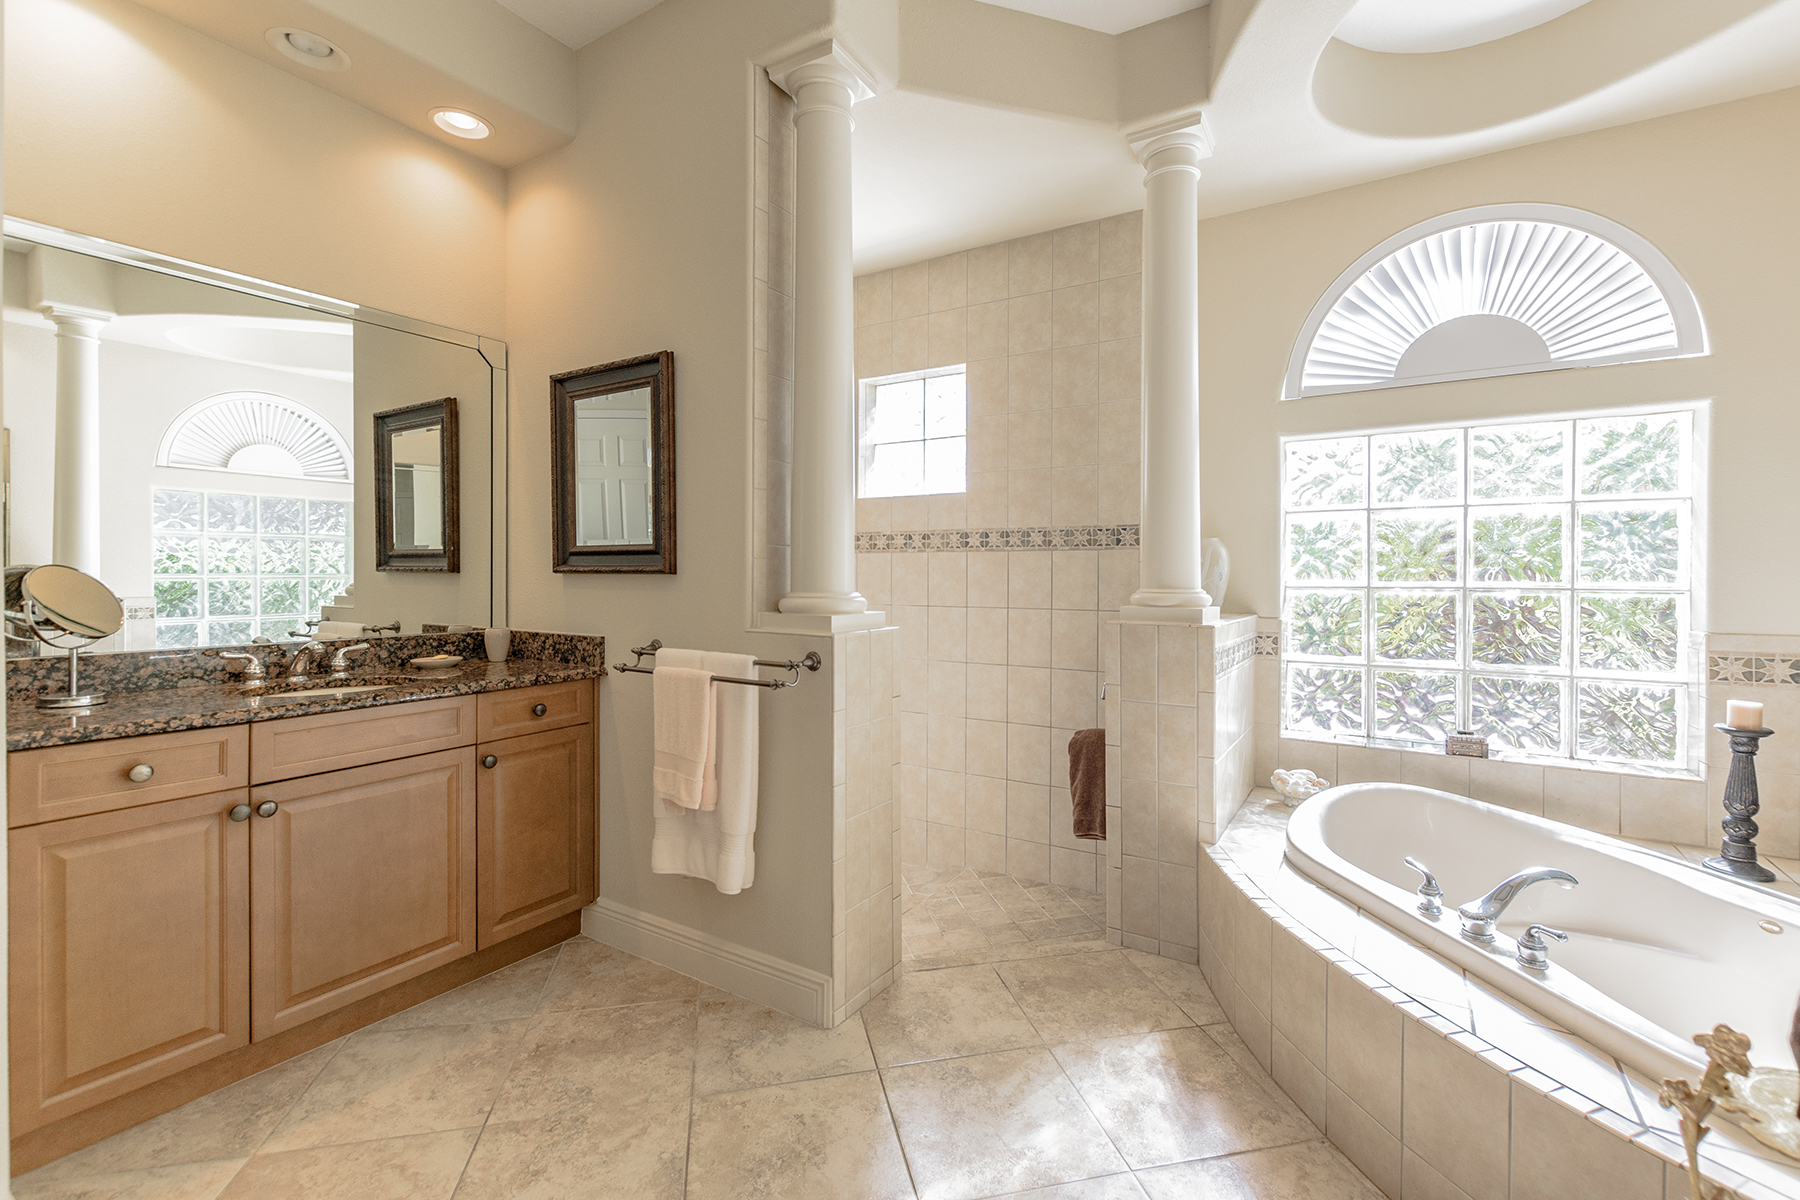 Additional photo for property listing at DAVENPORT 2526 Heritage Green Ave, Davenport, Florida 33837 Amerika Birleşik Devletleri